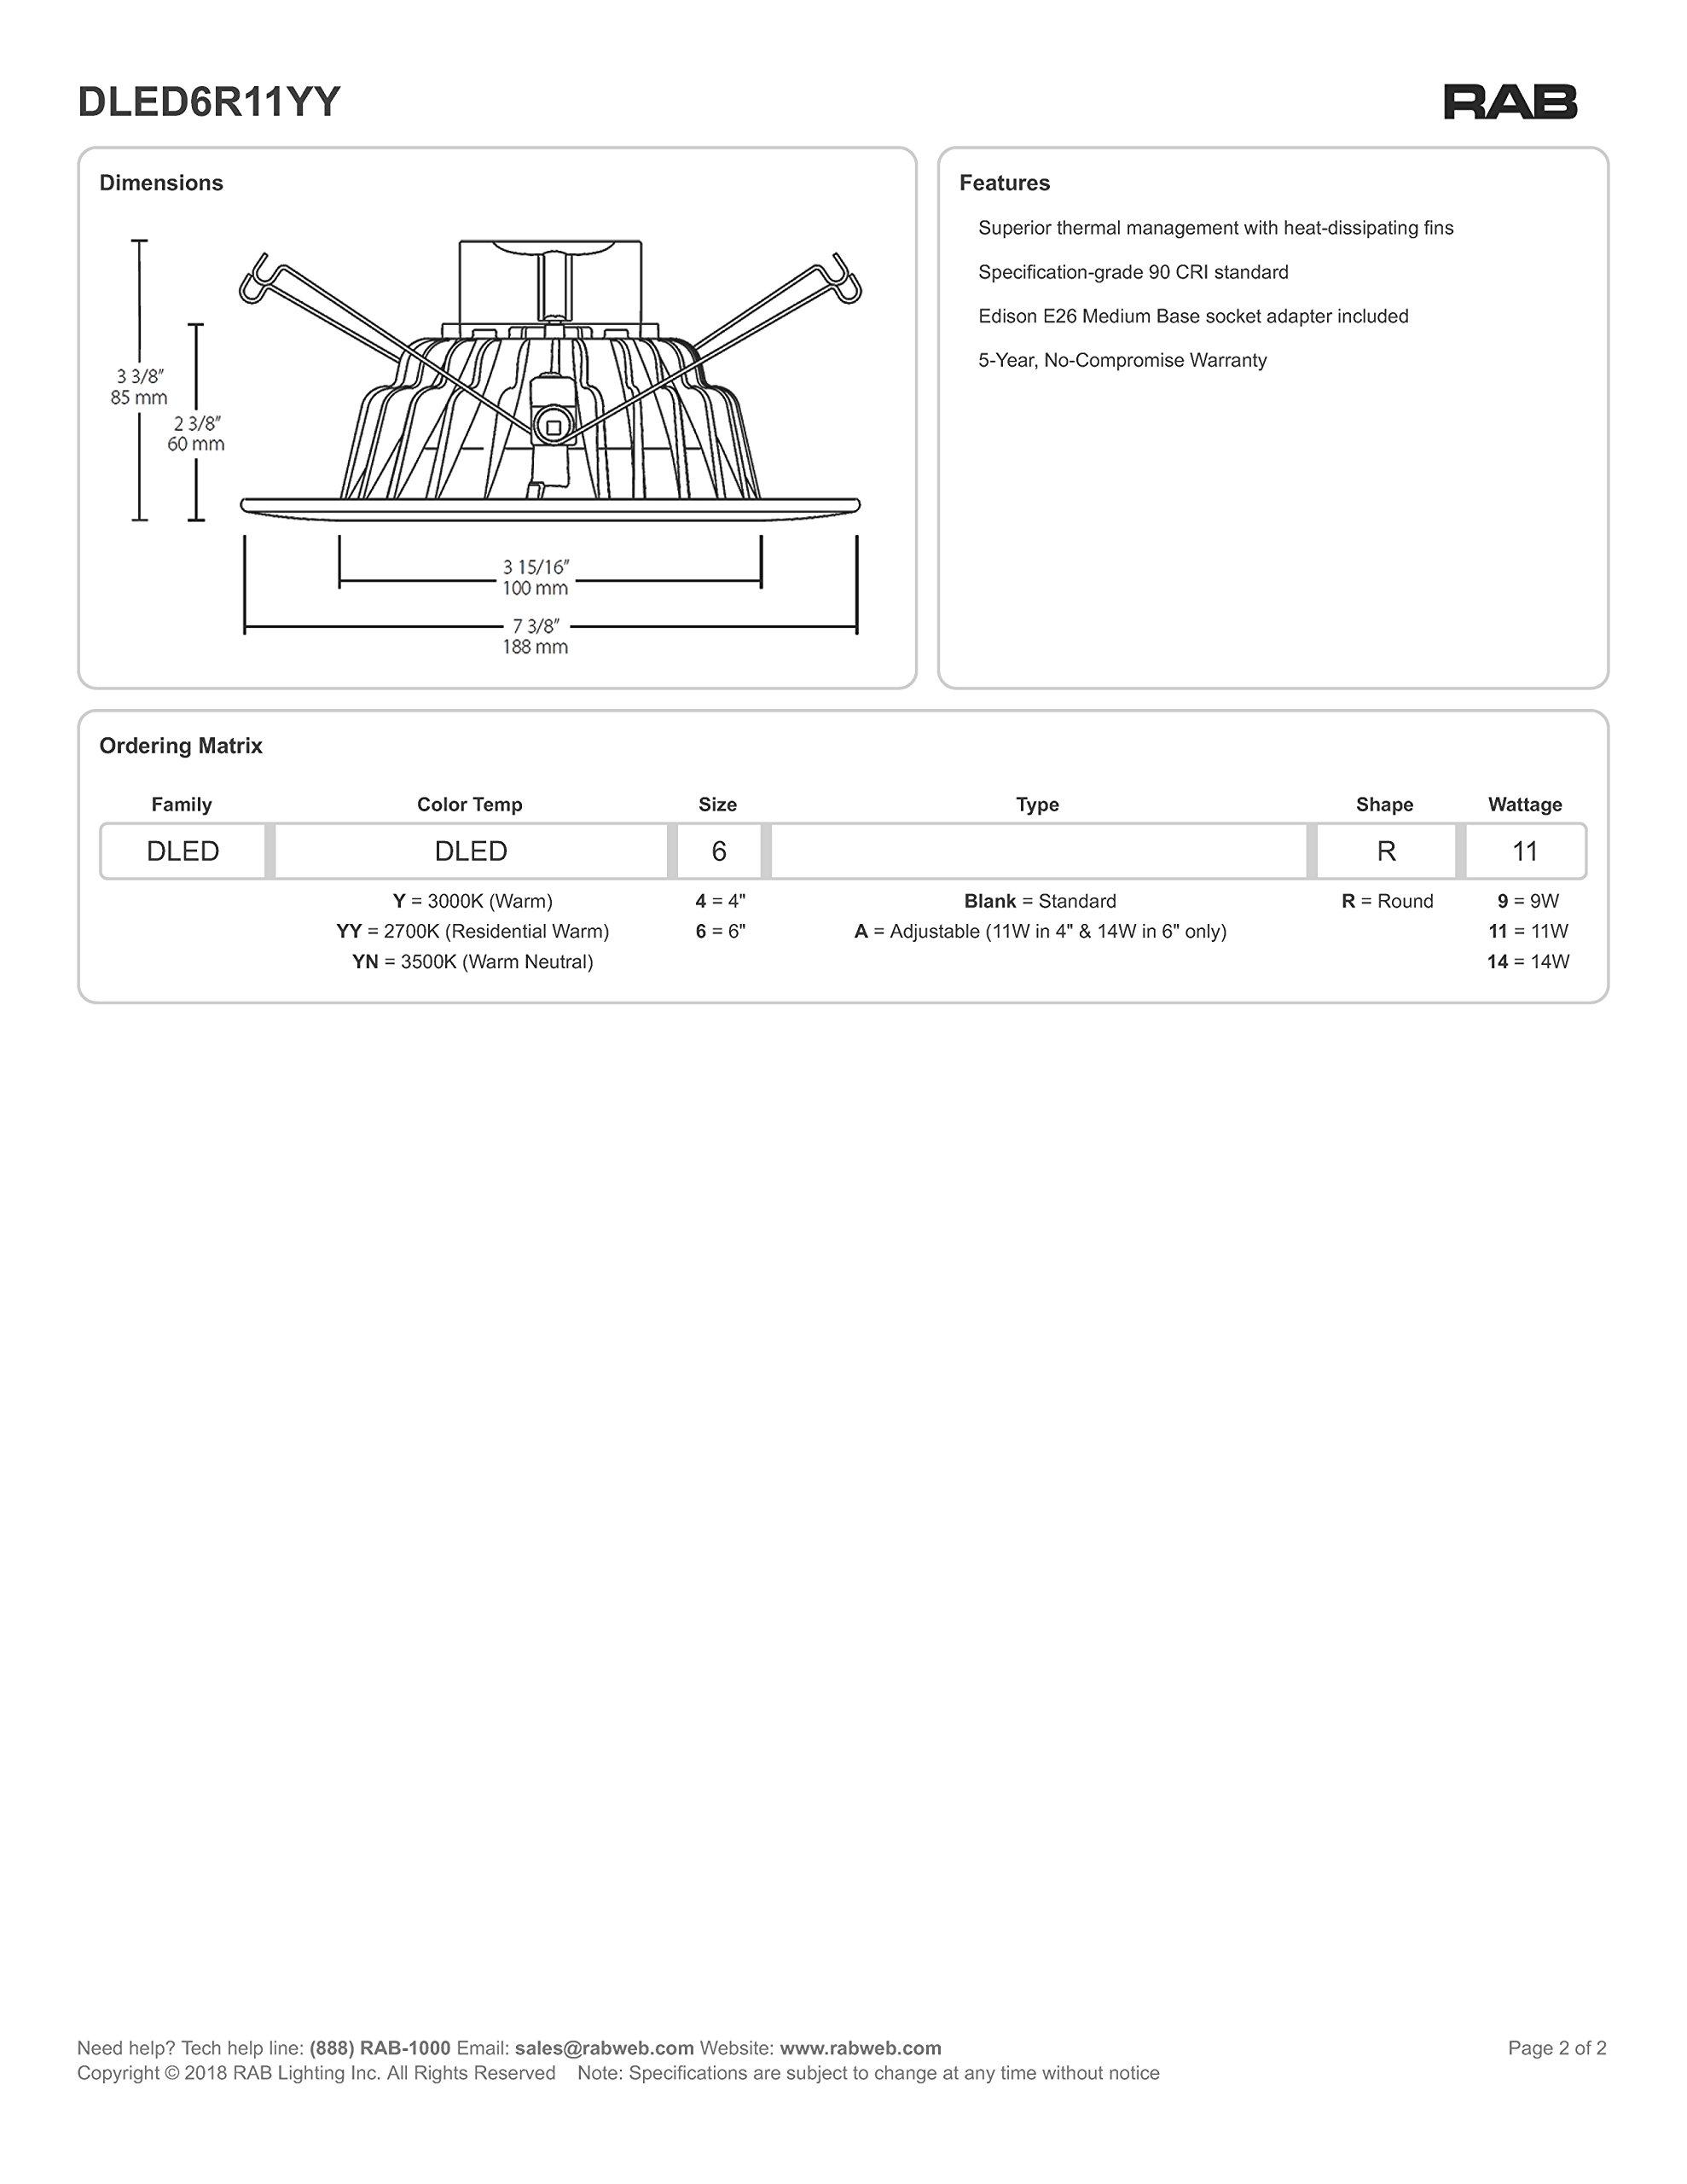 "6"" - 1Pk Can LED Lights & Recessed Retrofit Spotlights | 2700K Warm White Lighting - Dimmable | 11W | 120V | 842 Lumens | 60Hz | Easy Installation Light Fixture Trim Rings"